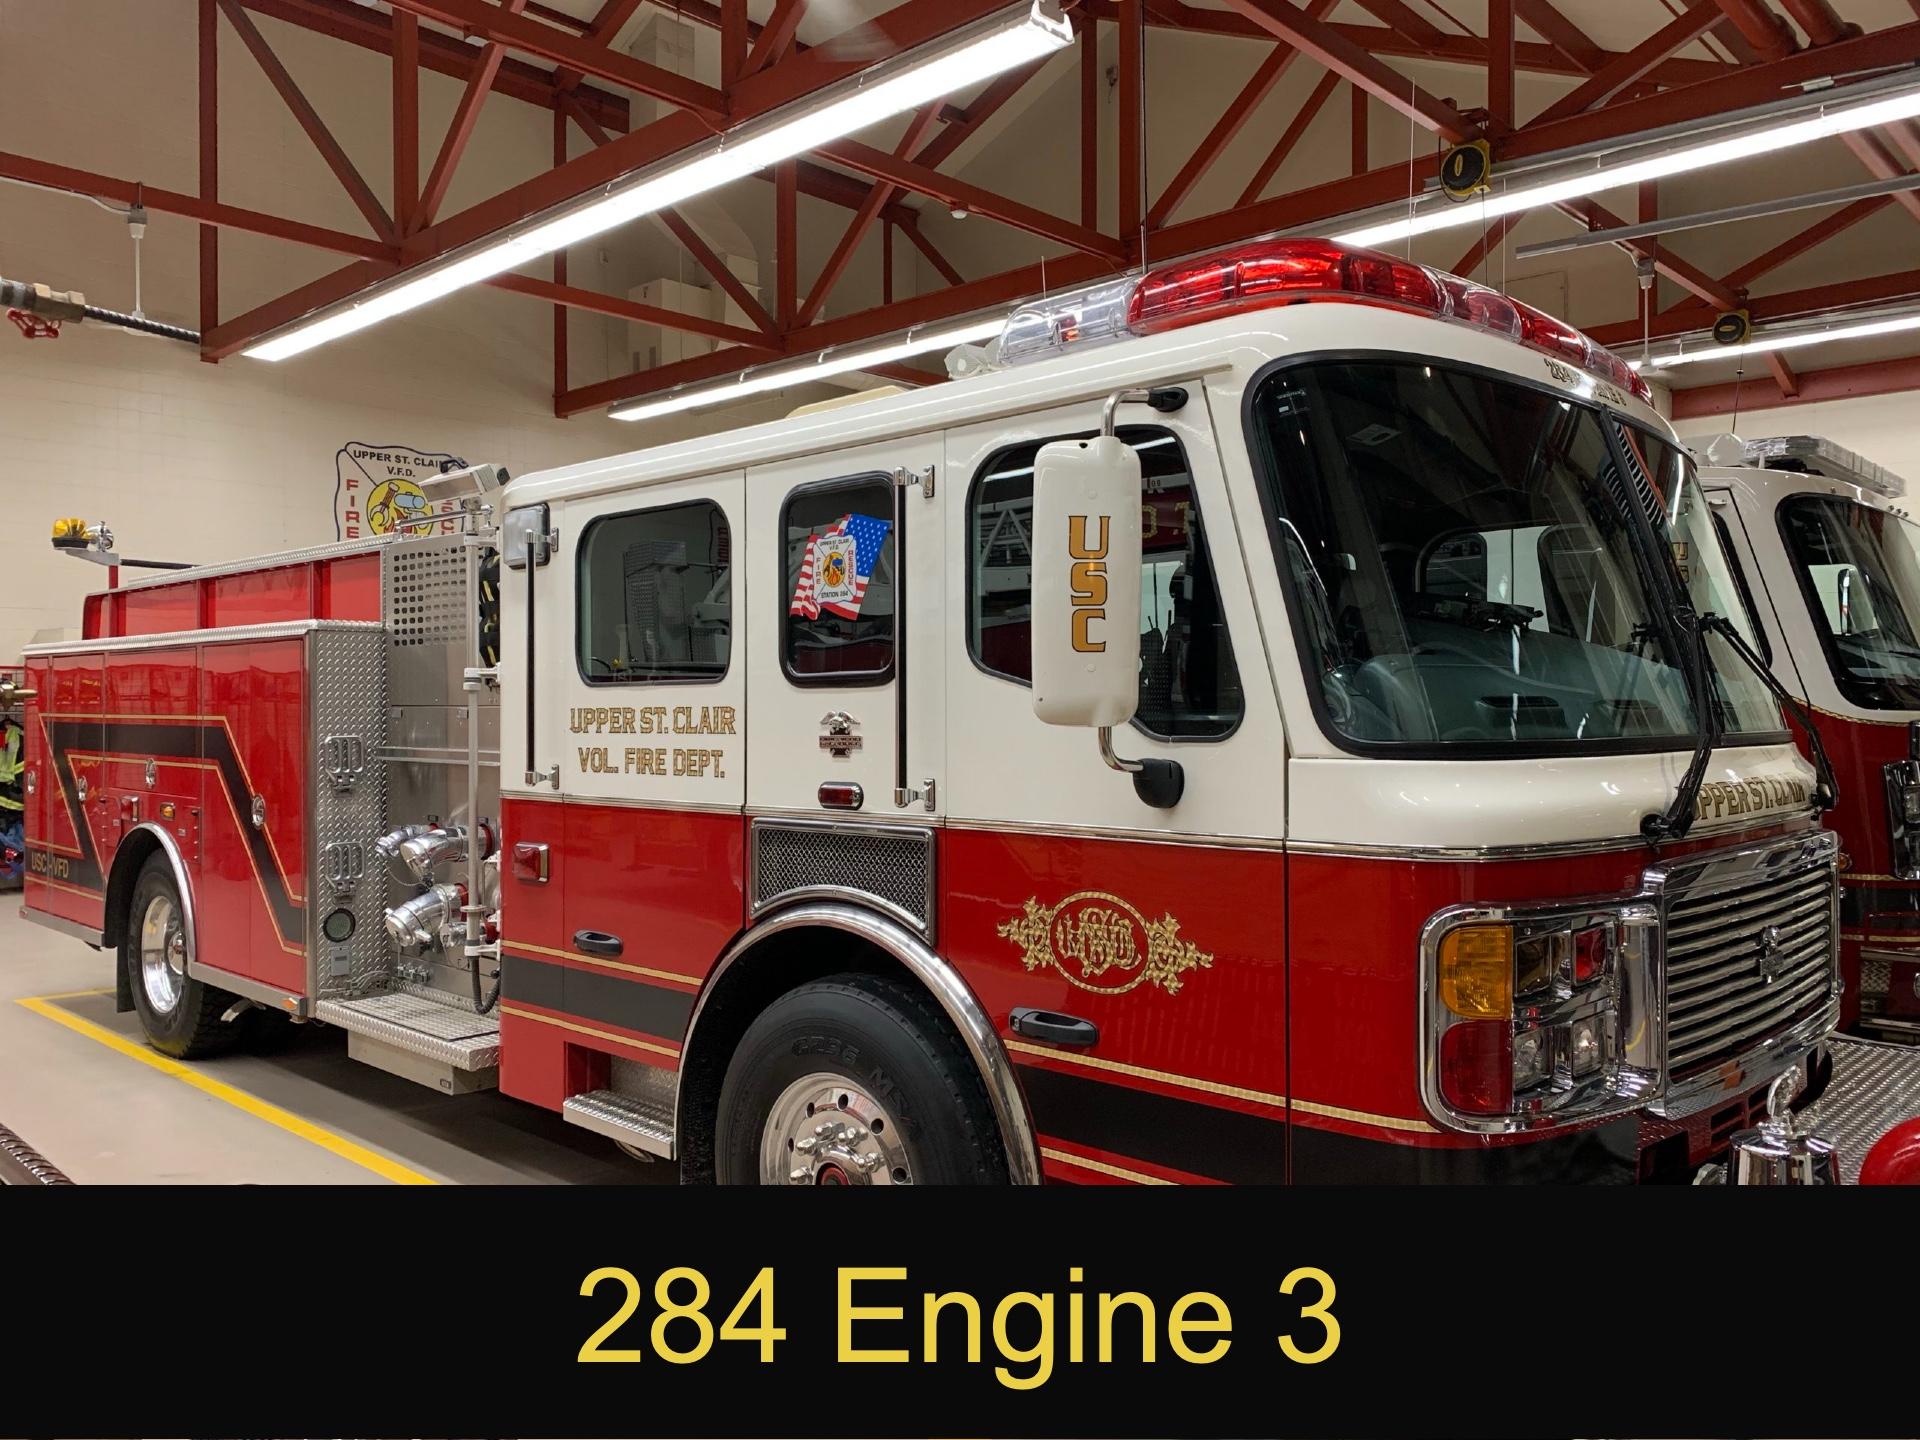 284 Engine 1